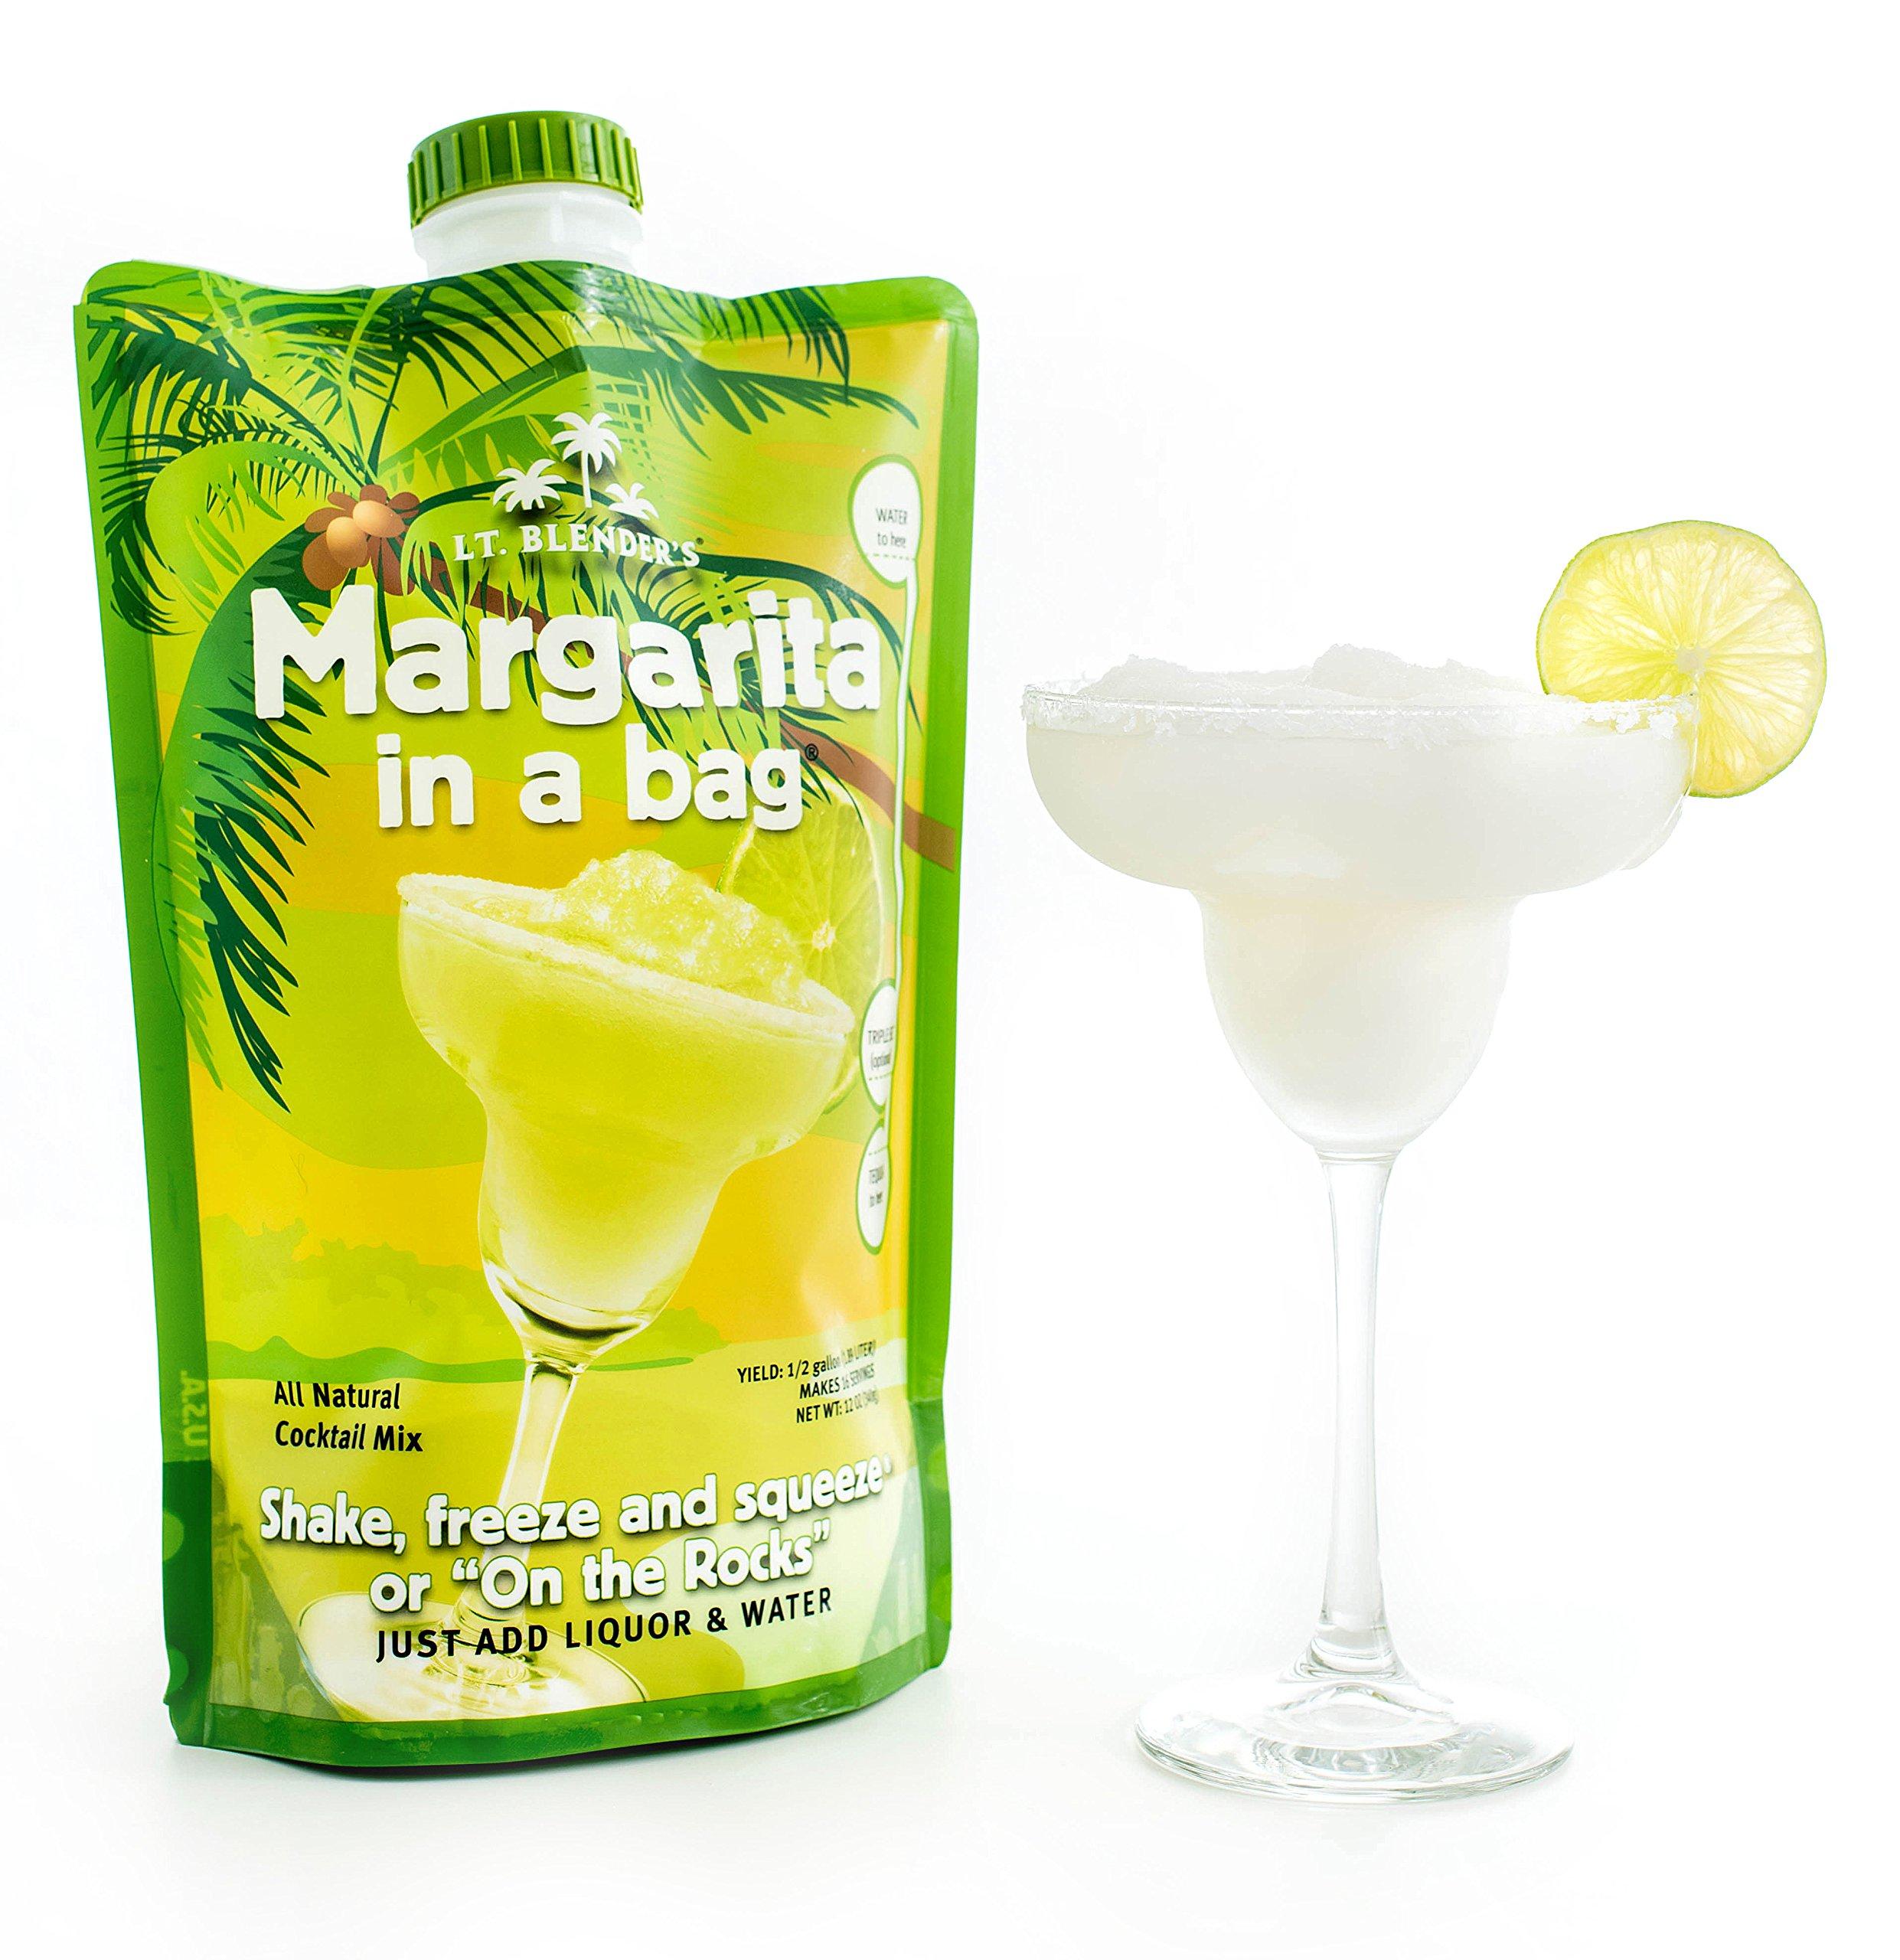 Lt. Blender's Margarita in a Bag, 12-Ounce Pouches (Pack of 3) by Lt. Blender's